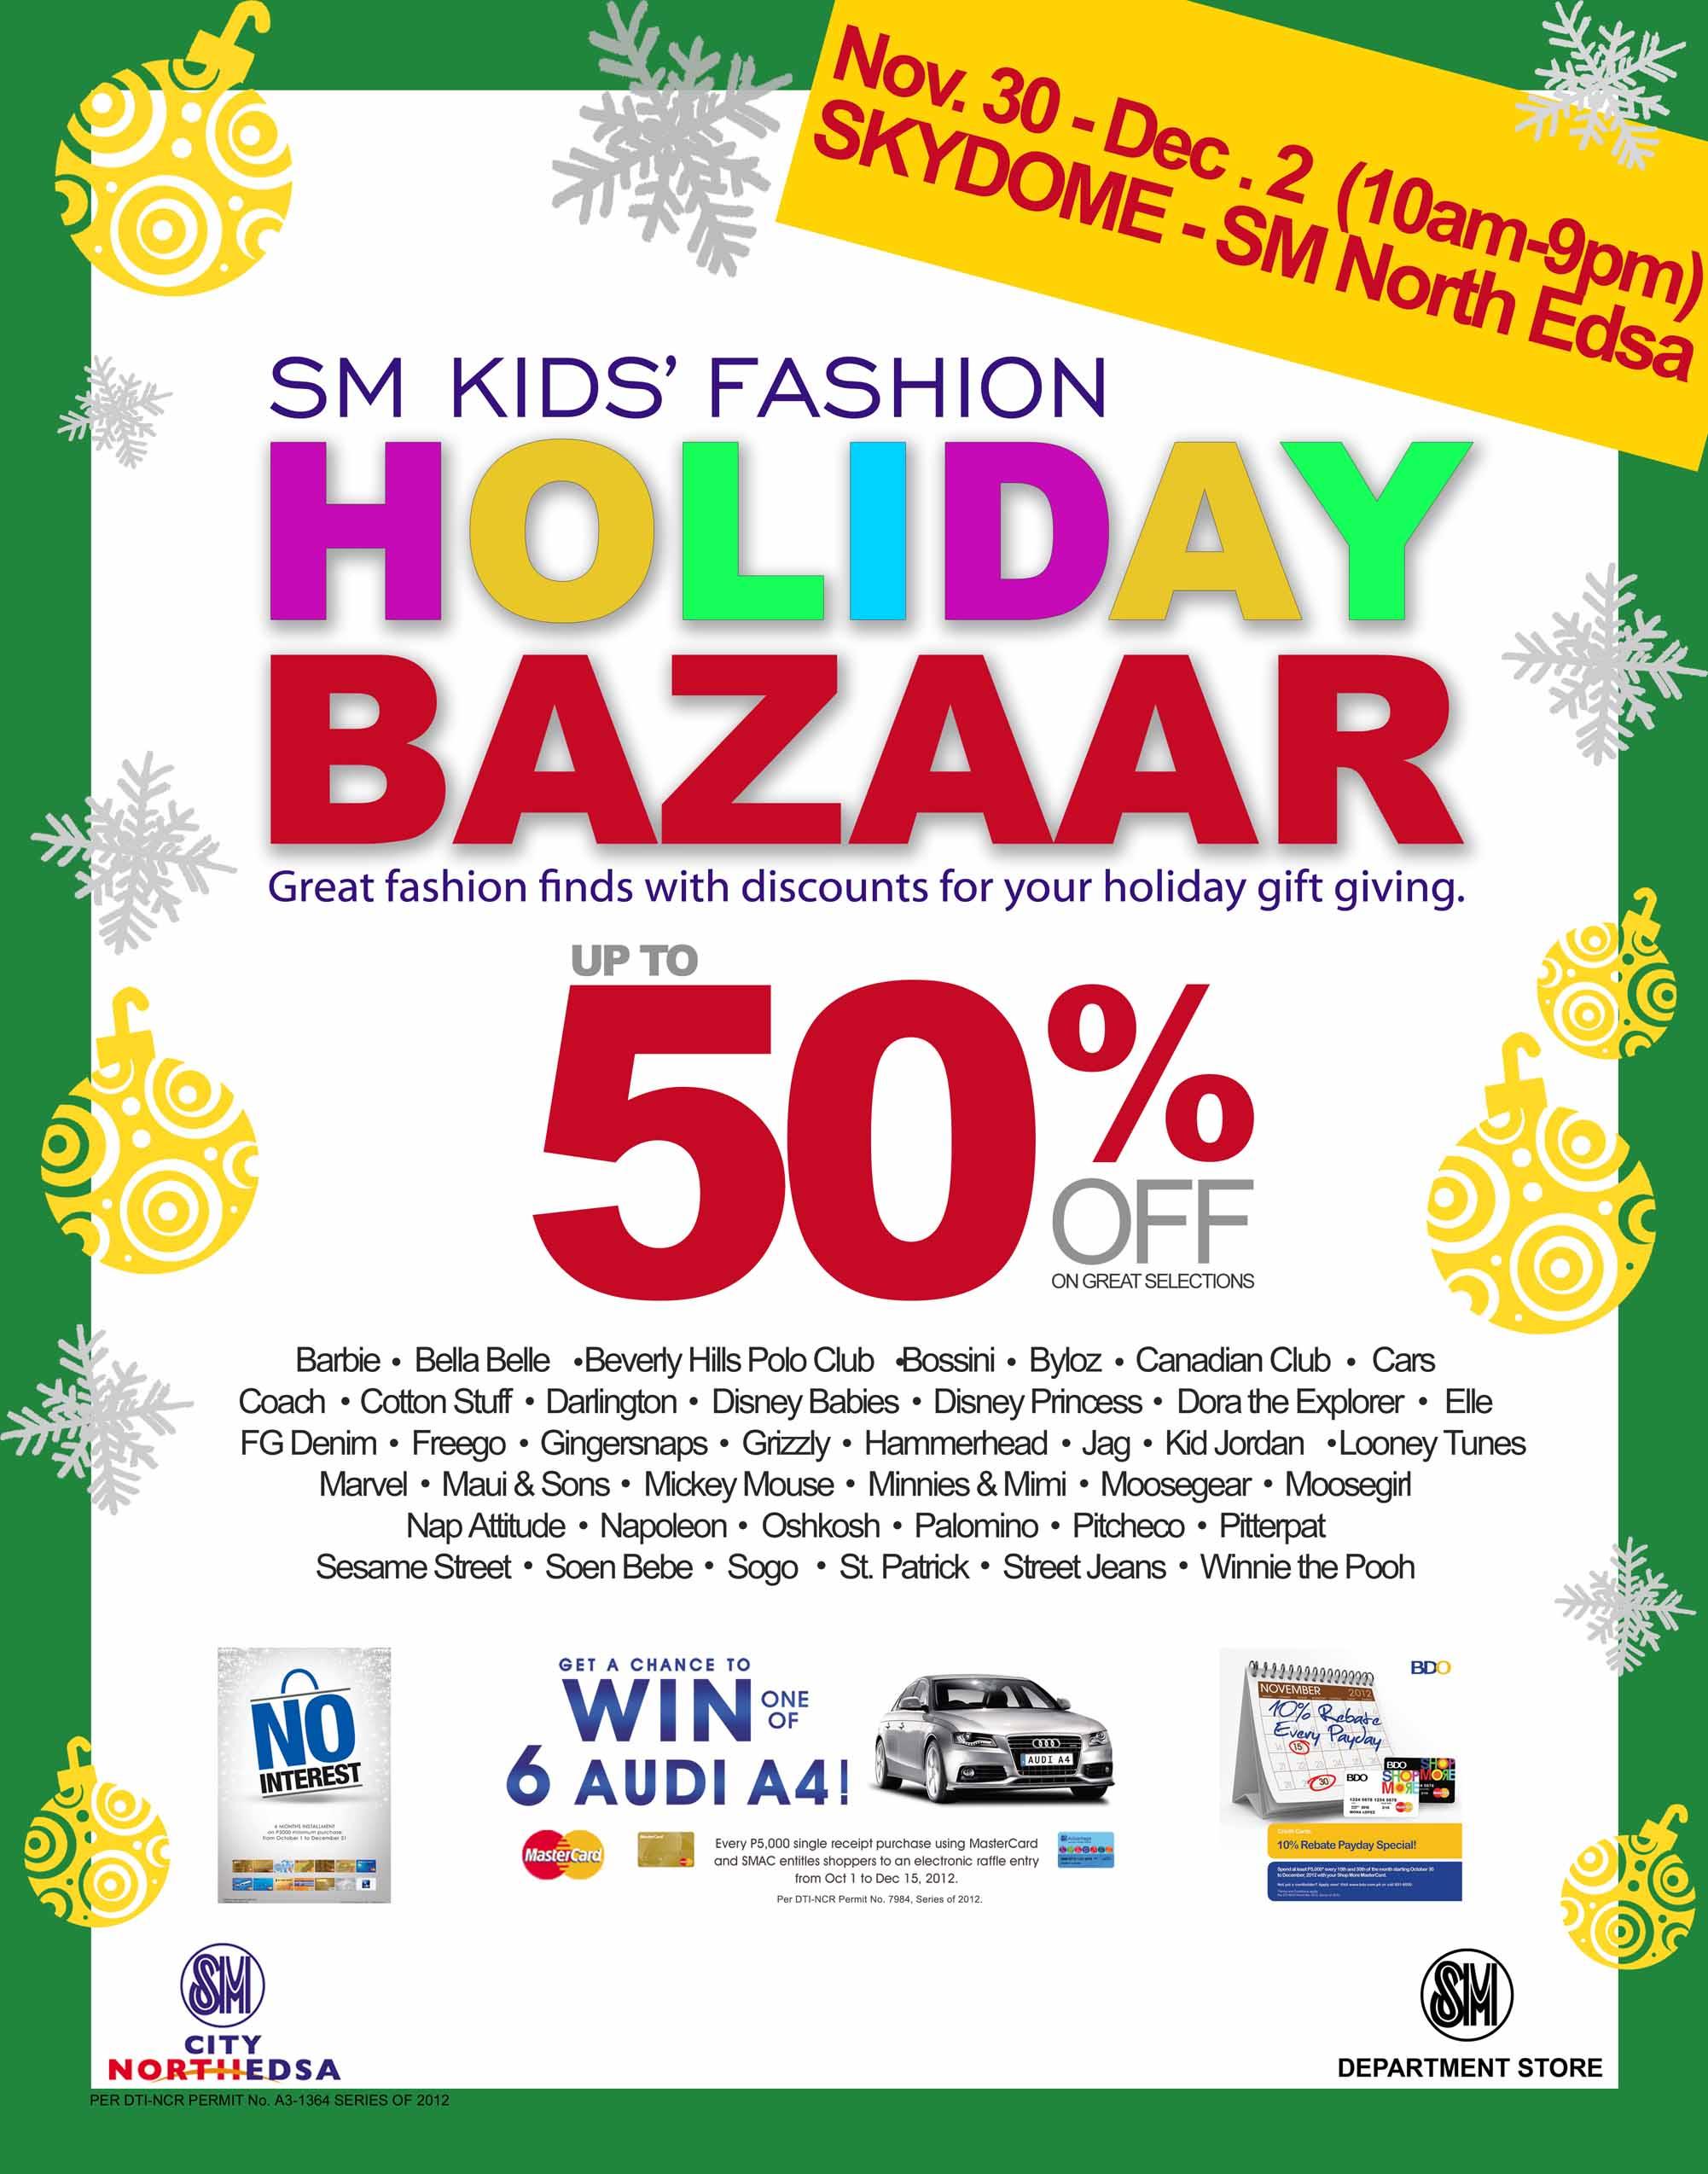 SM Kids Fashion Holiday Bazaar @ SM City North Edsa November - December 2012